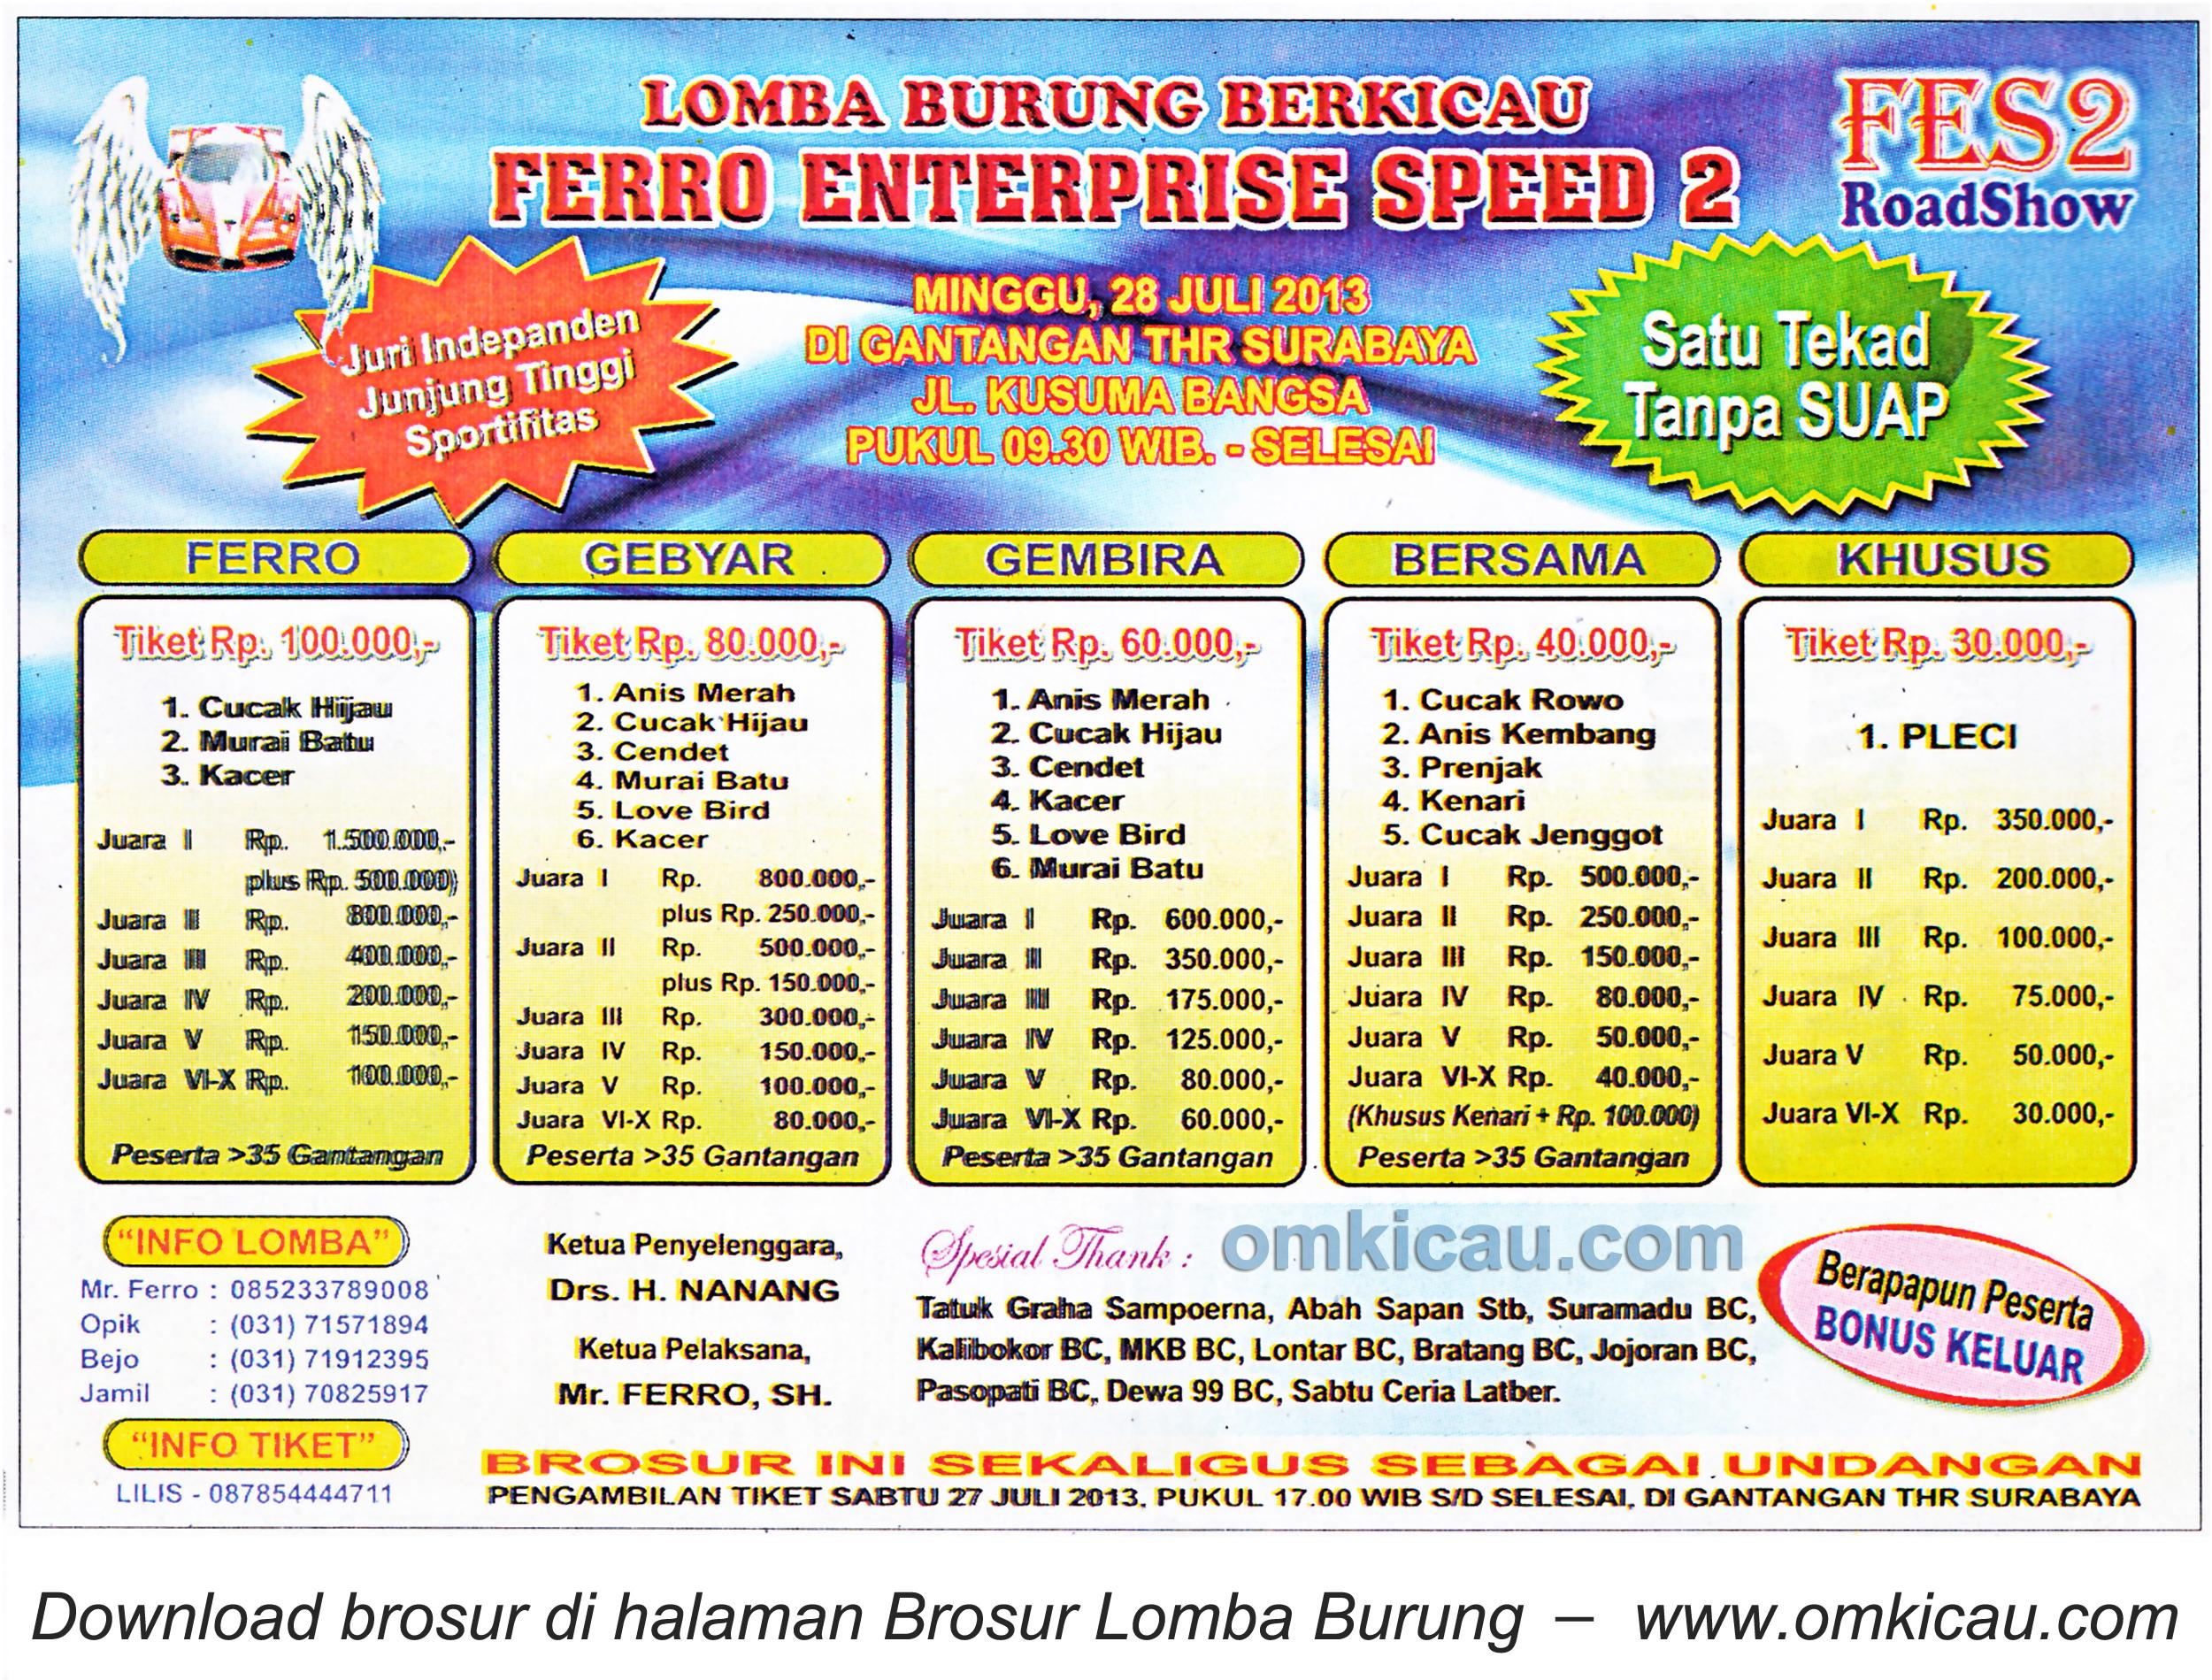 Brosur Lomba Ferro Enterprise Speed 2 - Surabaya 28 Juli 2013